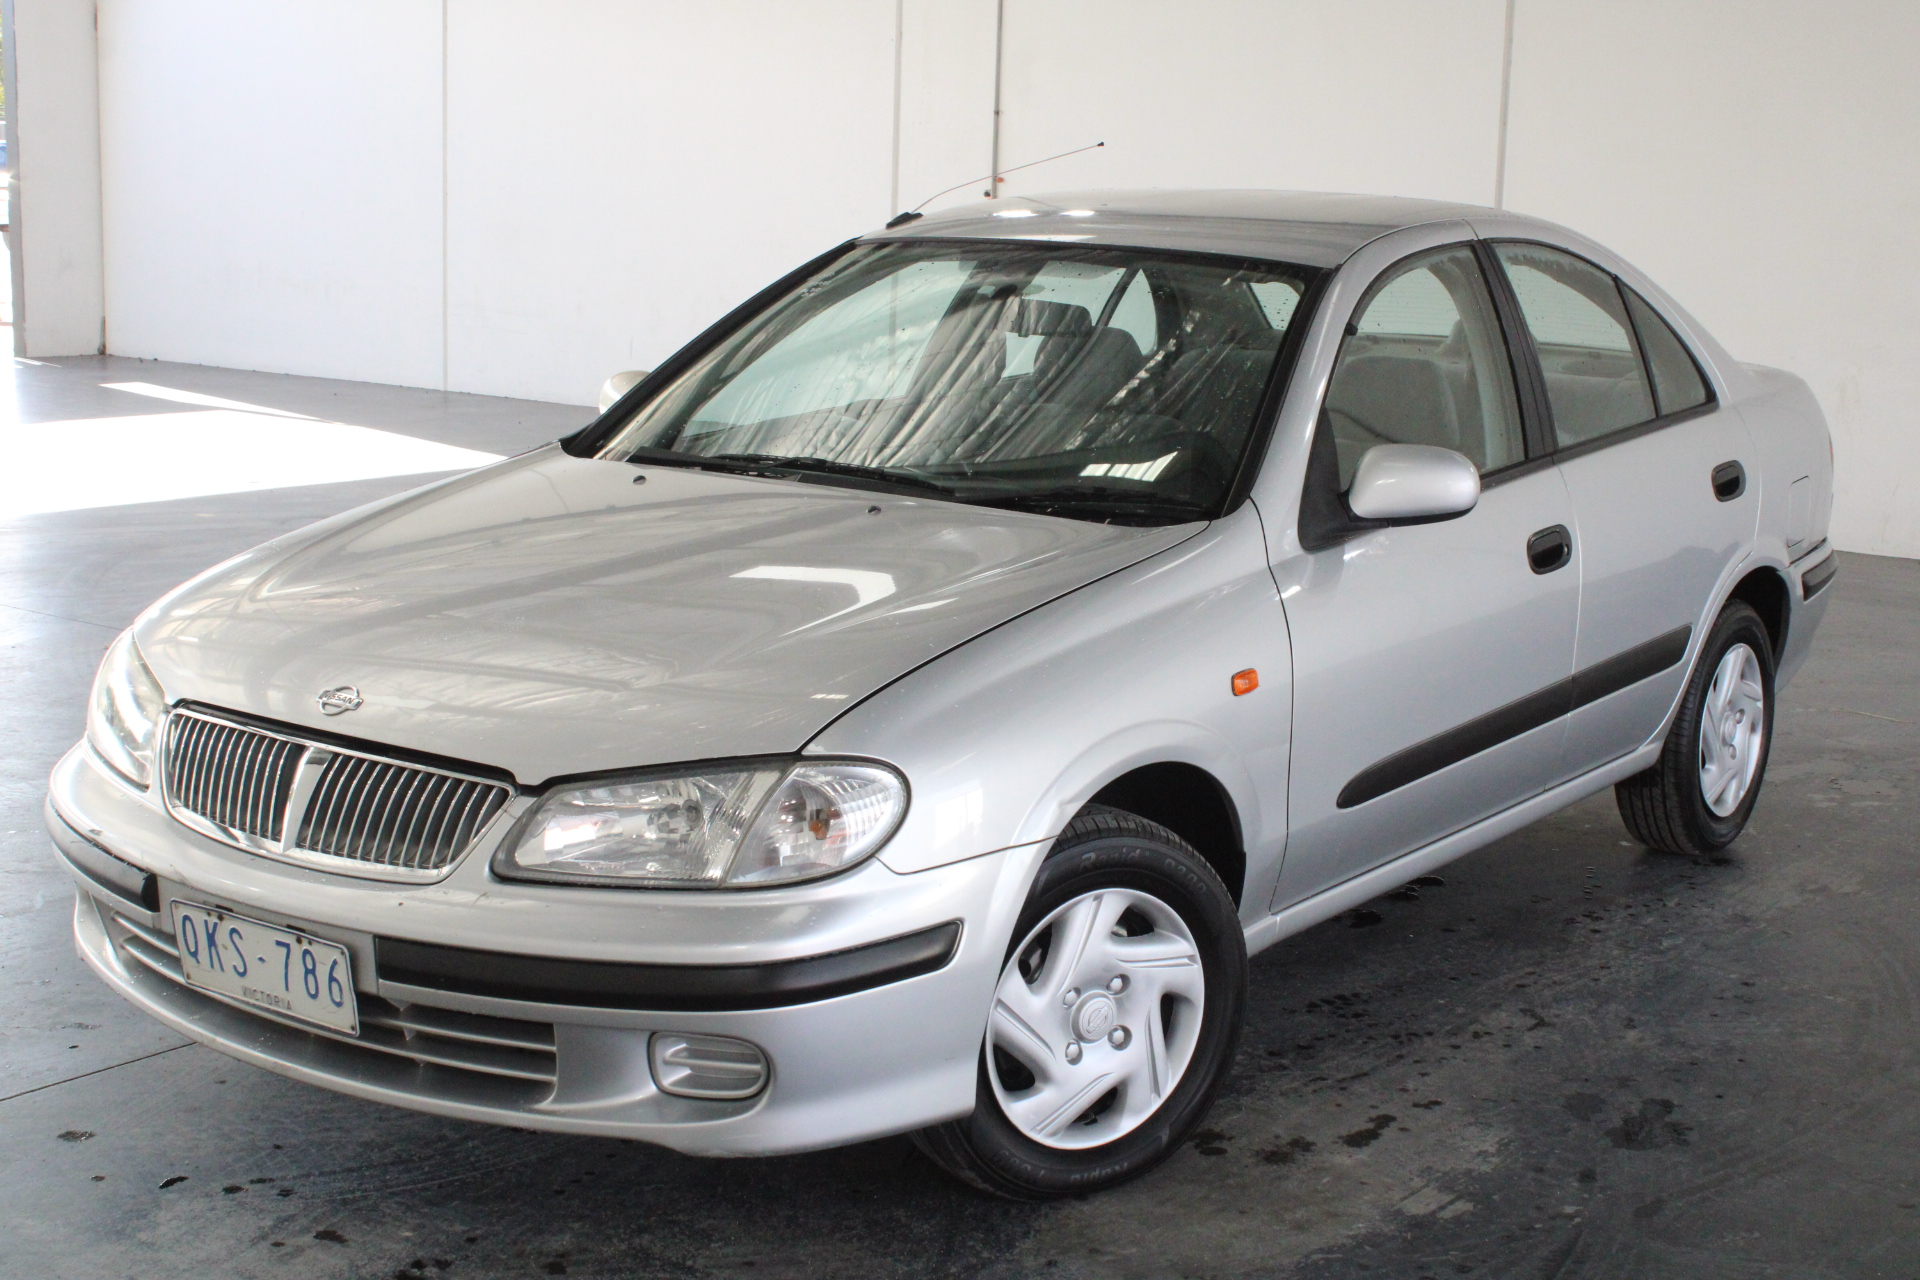 2000 Nissan Pulsar LX N16 Automatic Sedan